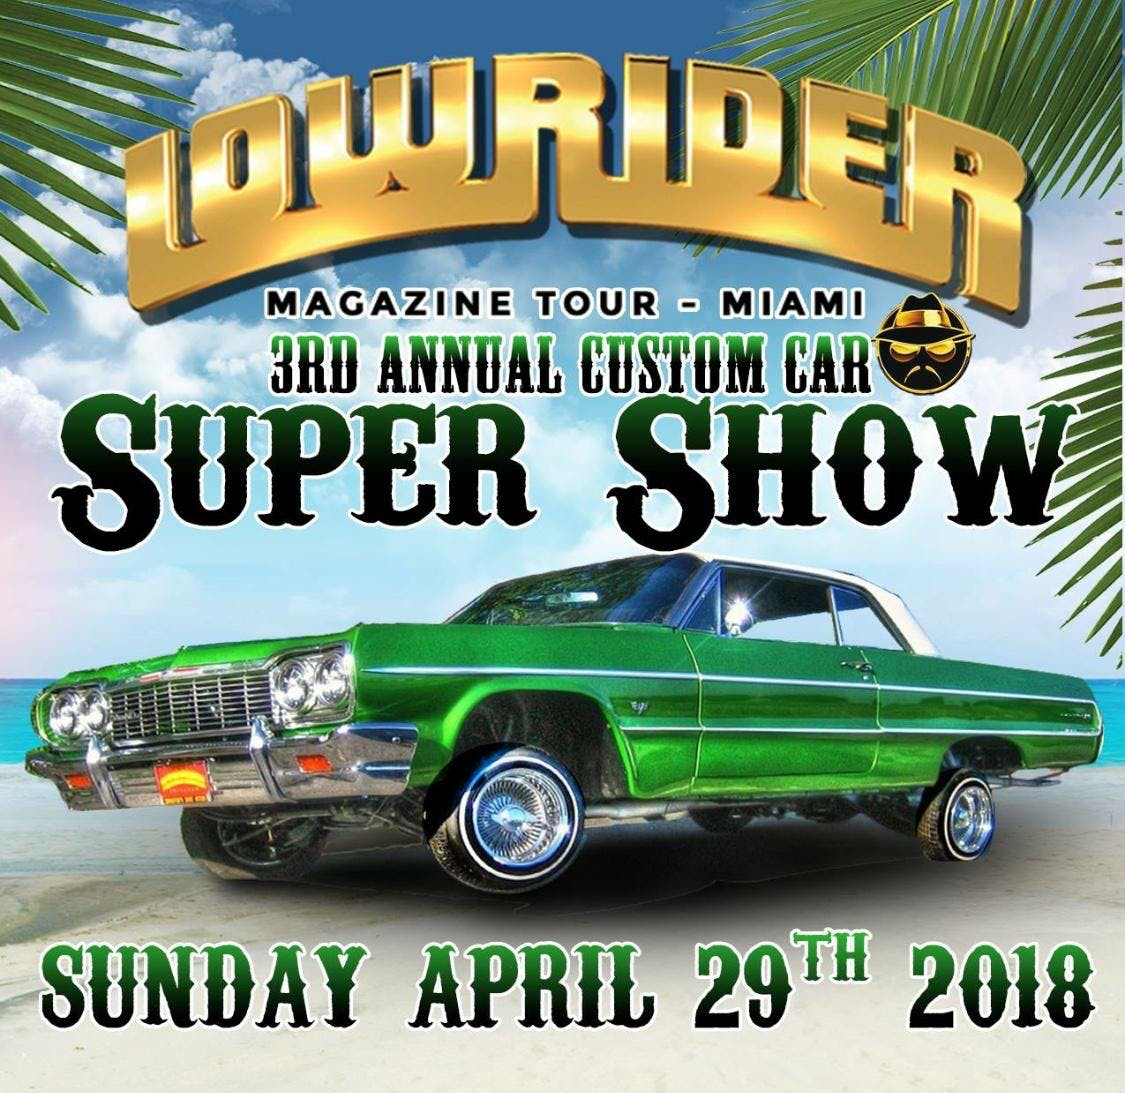 Miami Lowrider Car Show At MiamiDade County Fair Exposition Inc - Lowrider car show san francisco 2018